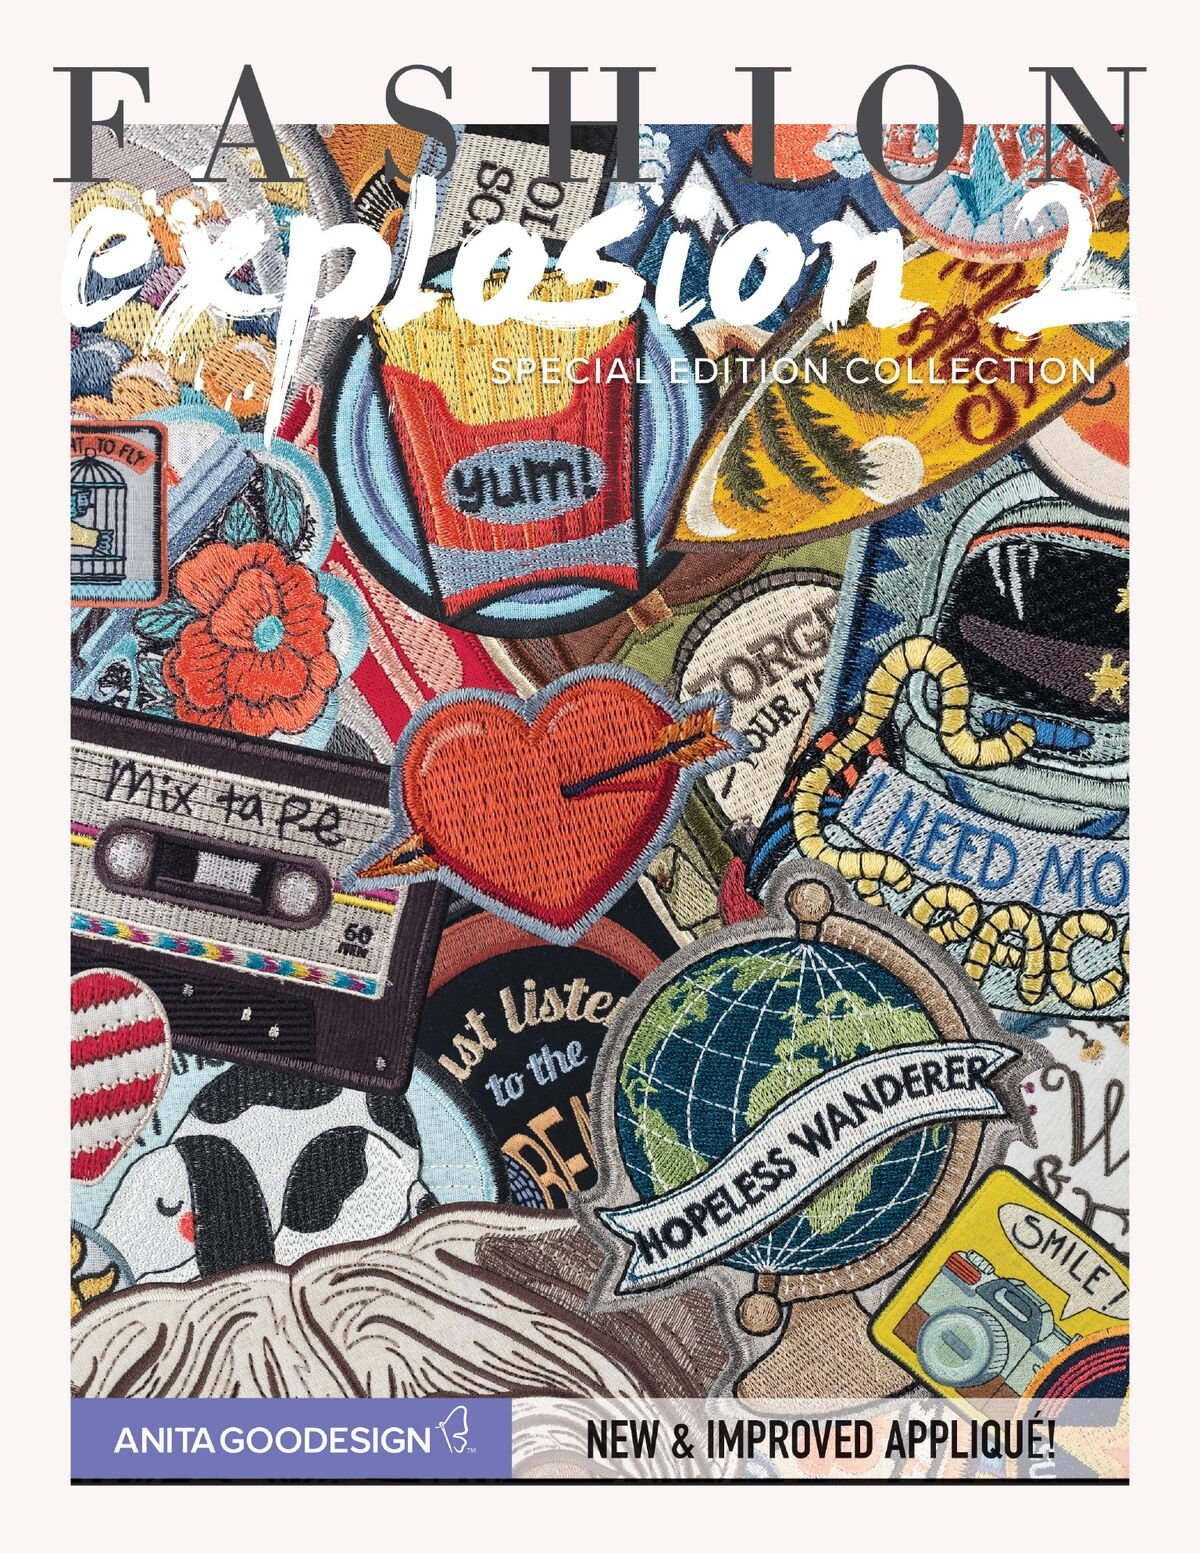 Anita Goodesign Fashion Explosion 2 Special Edition